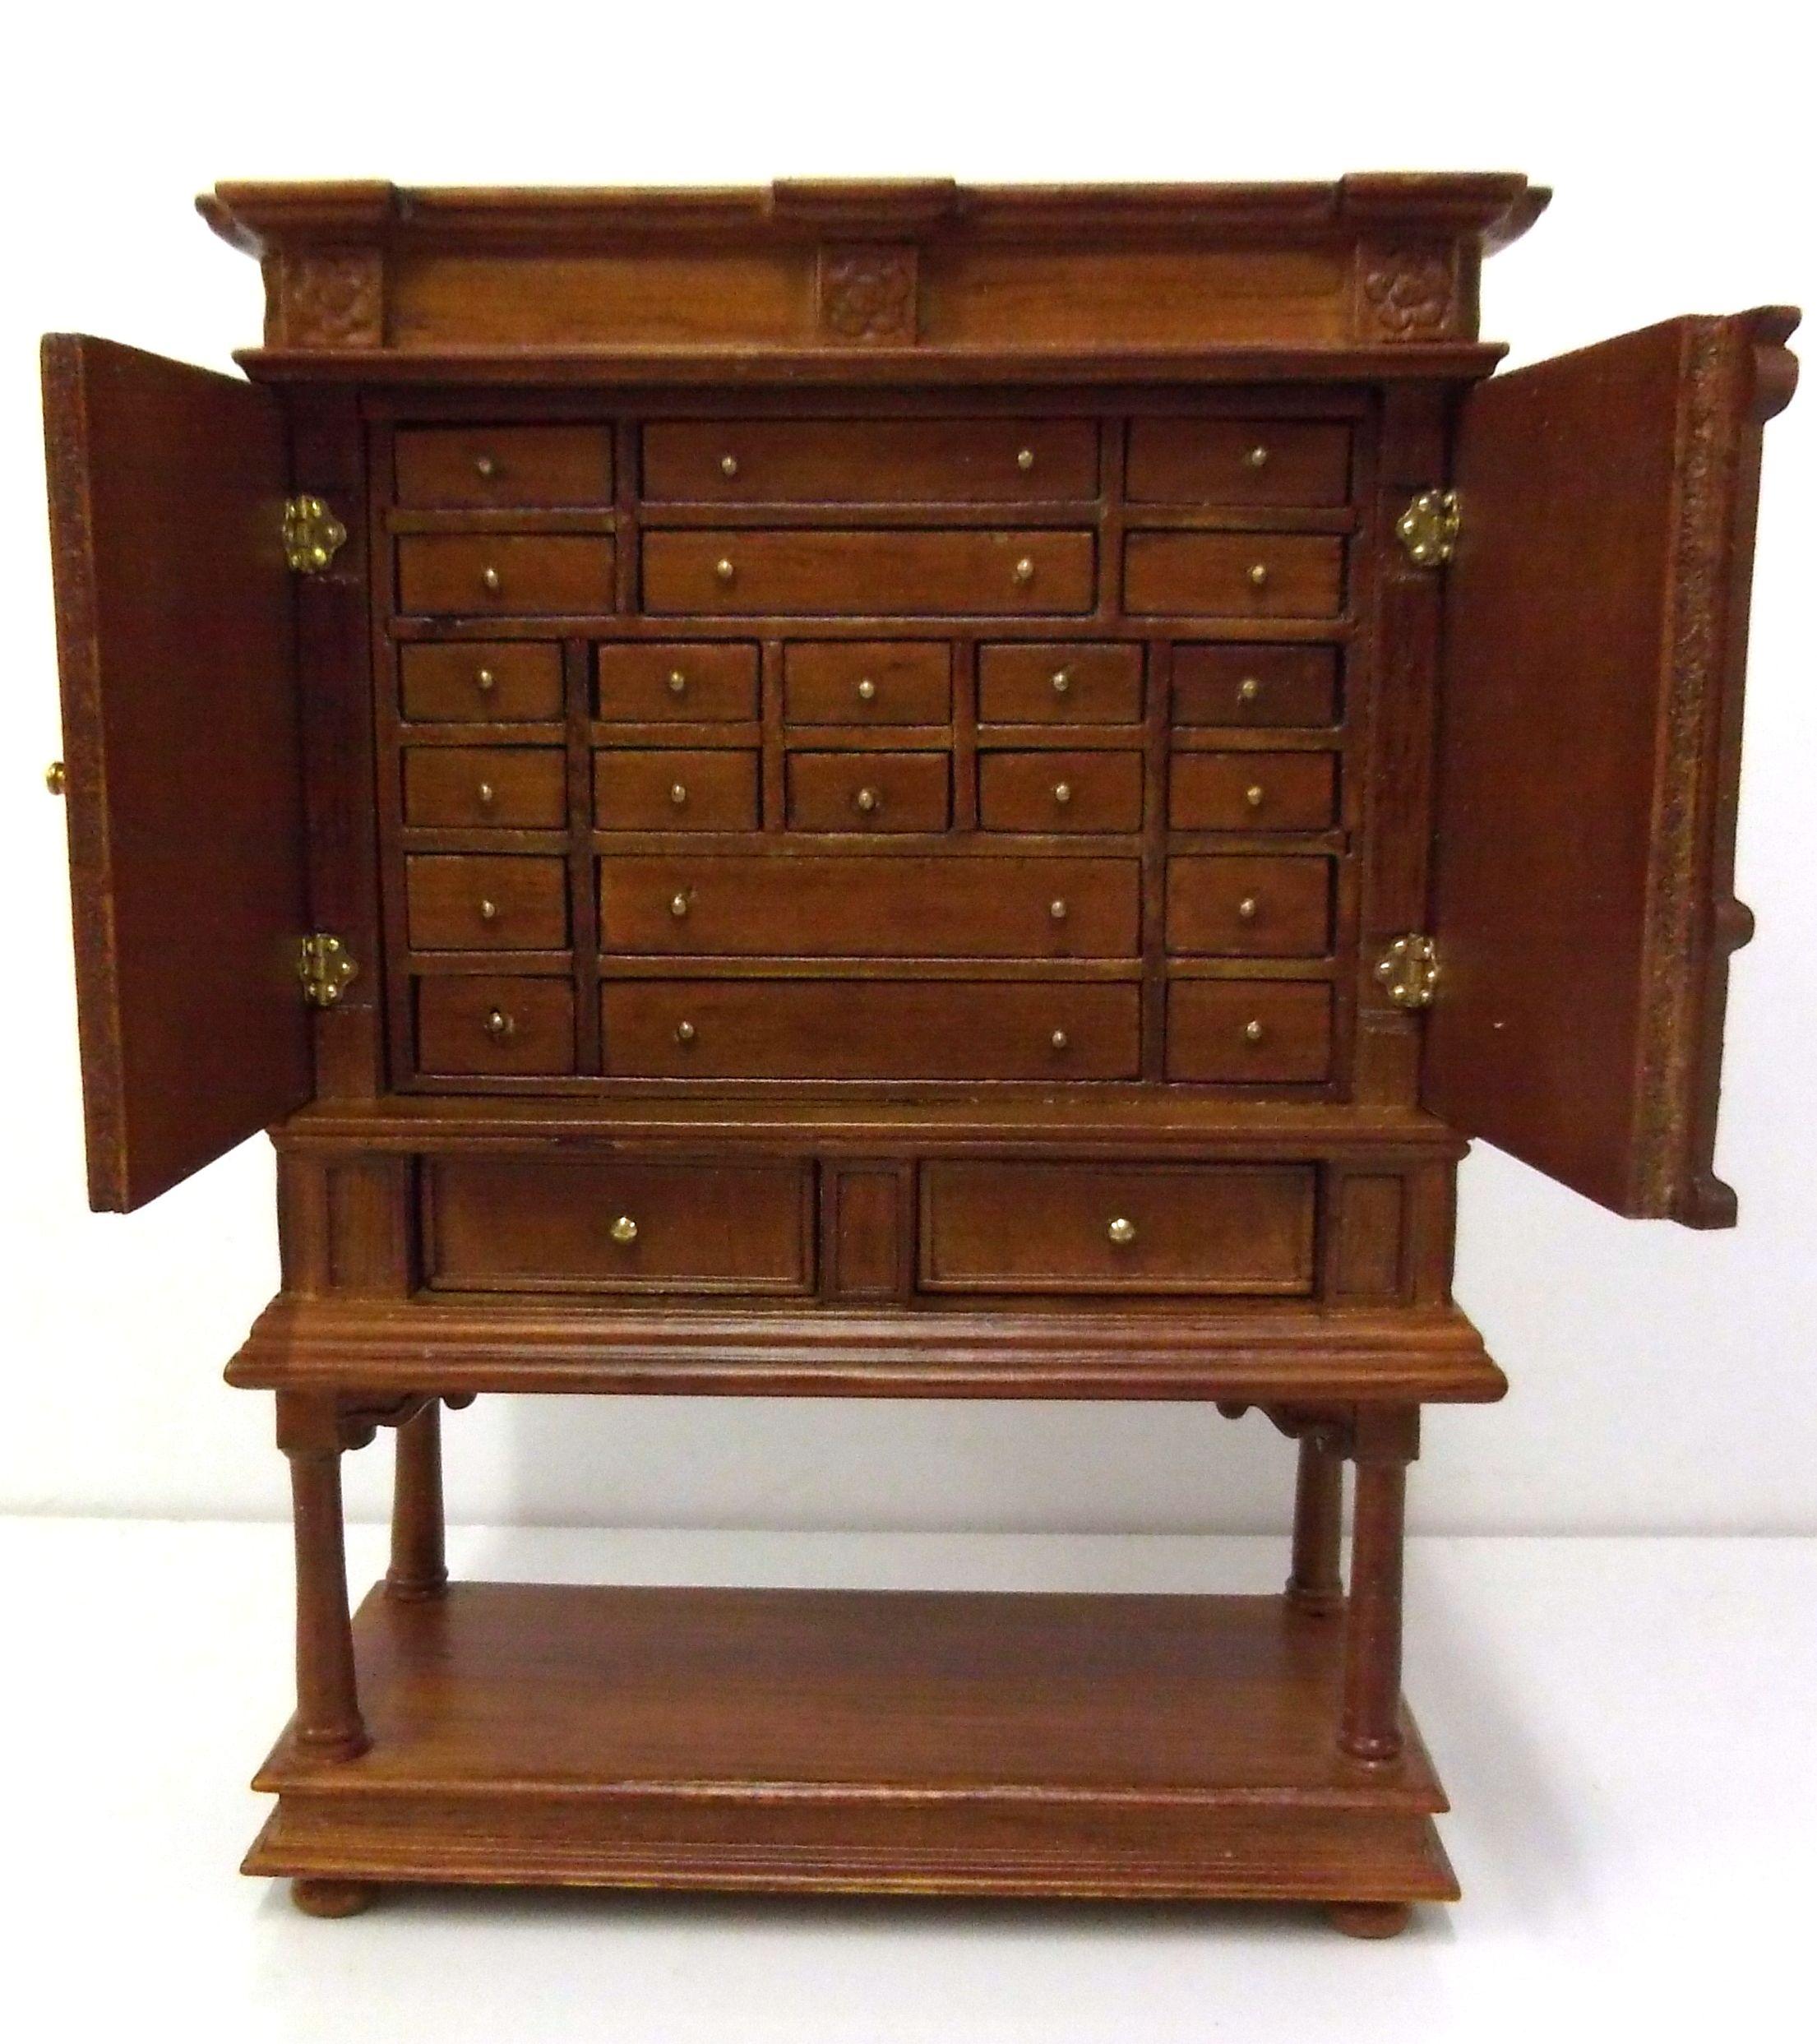 Dolls House Fine Miniature 1 12 Furniture Jiayi Jia Yi Walnut Apothecary  Cabinet